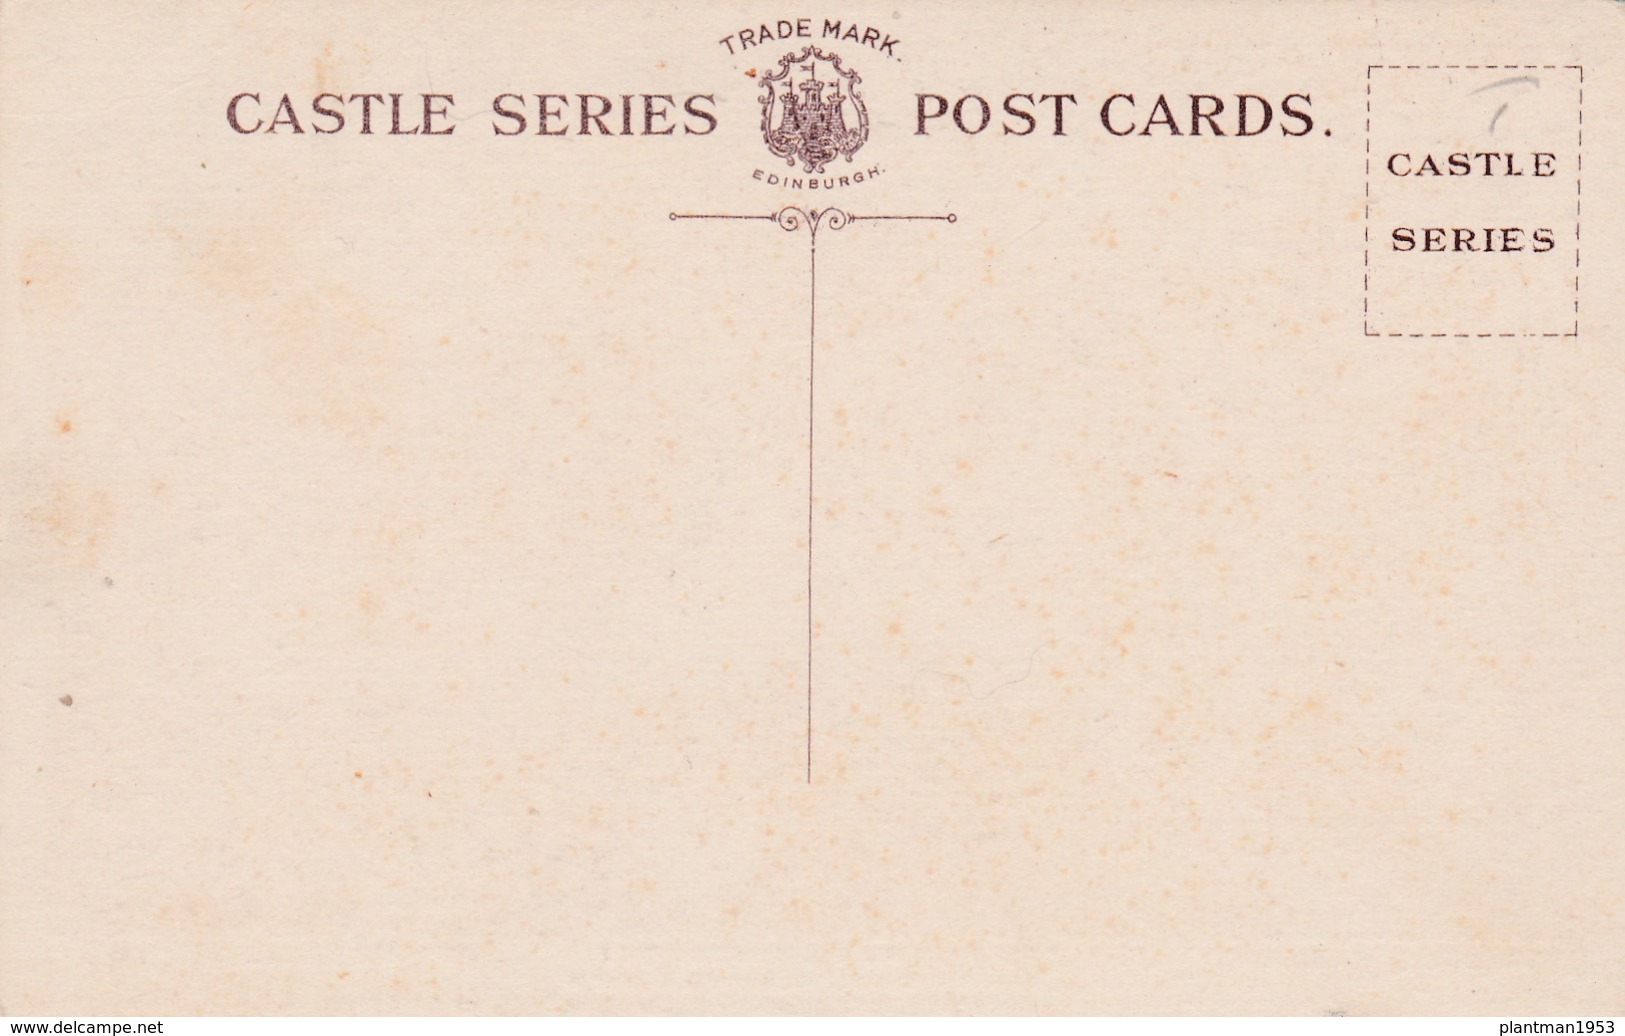 Small Post Card Of Homeward,Swanston,James Patrick,V105. - Scotland